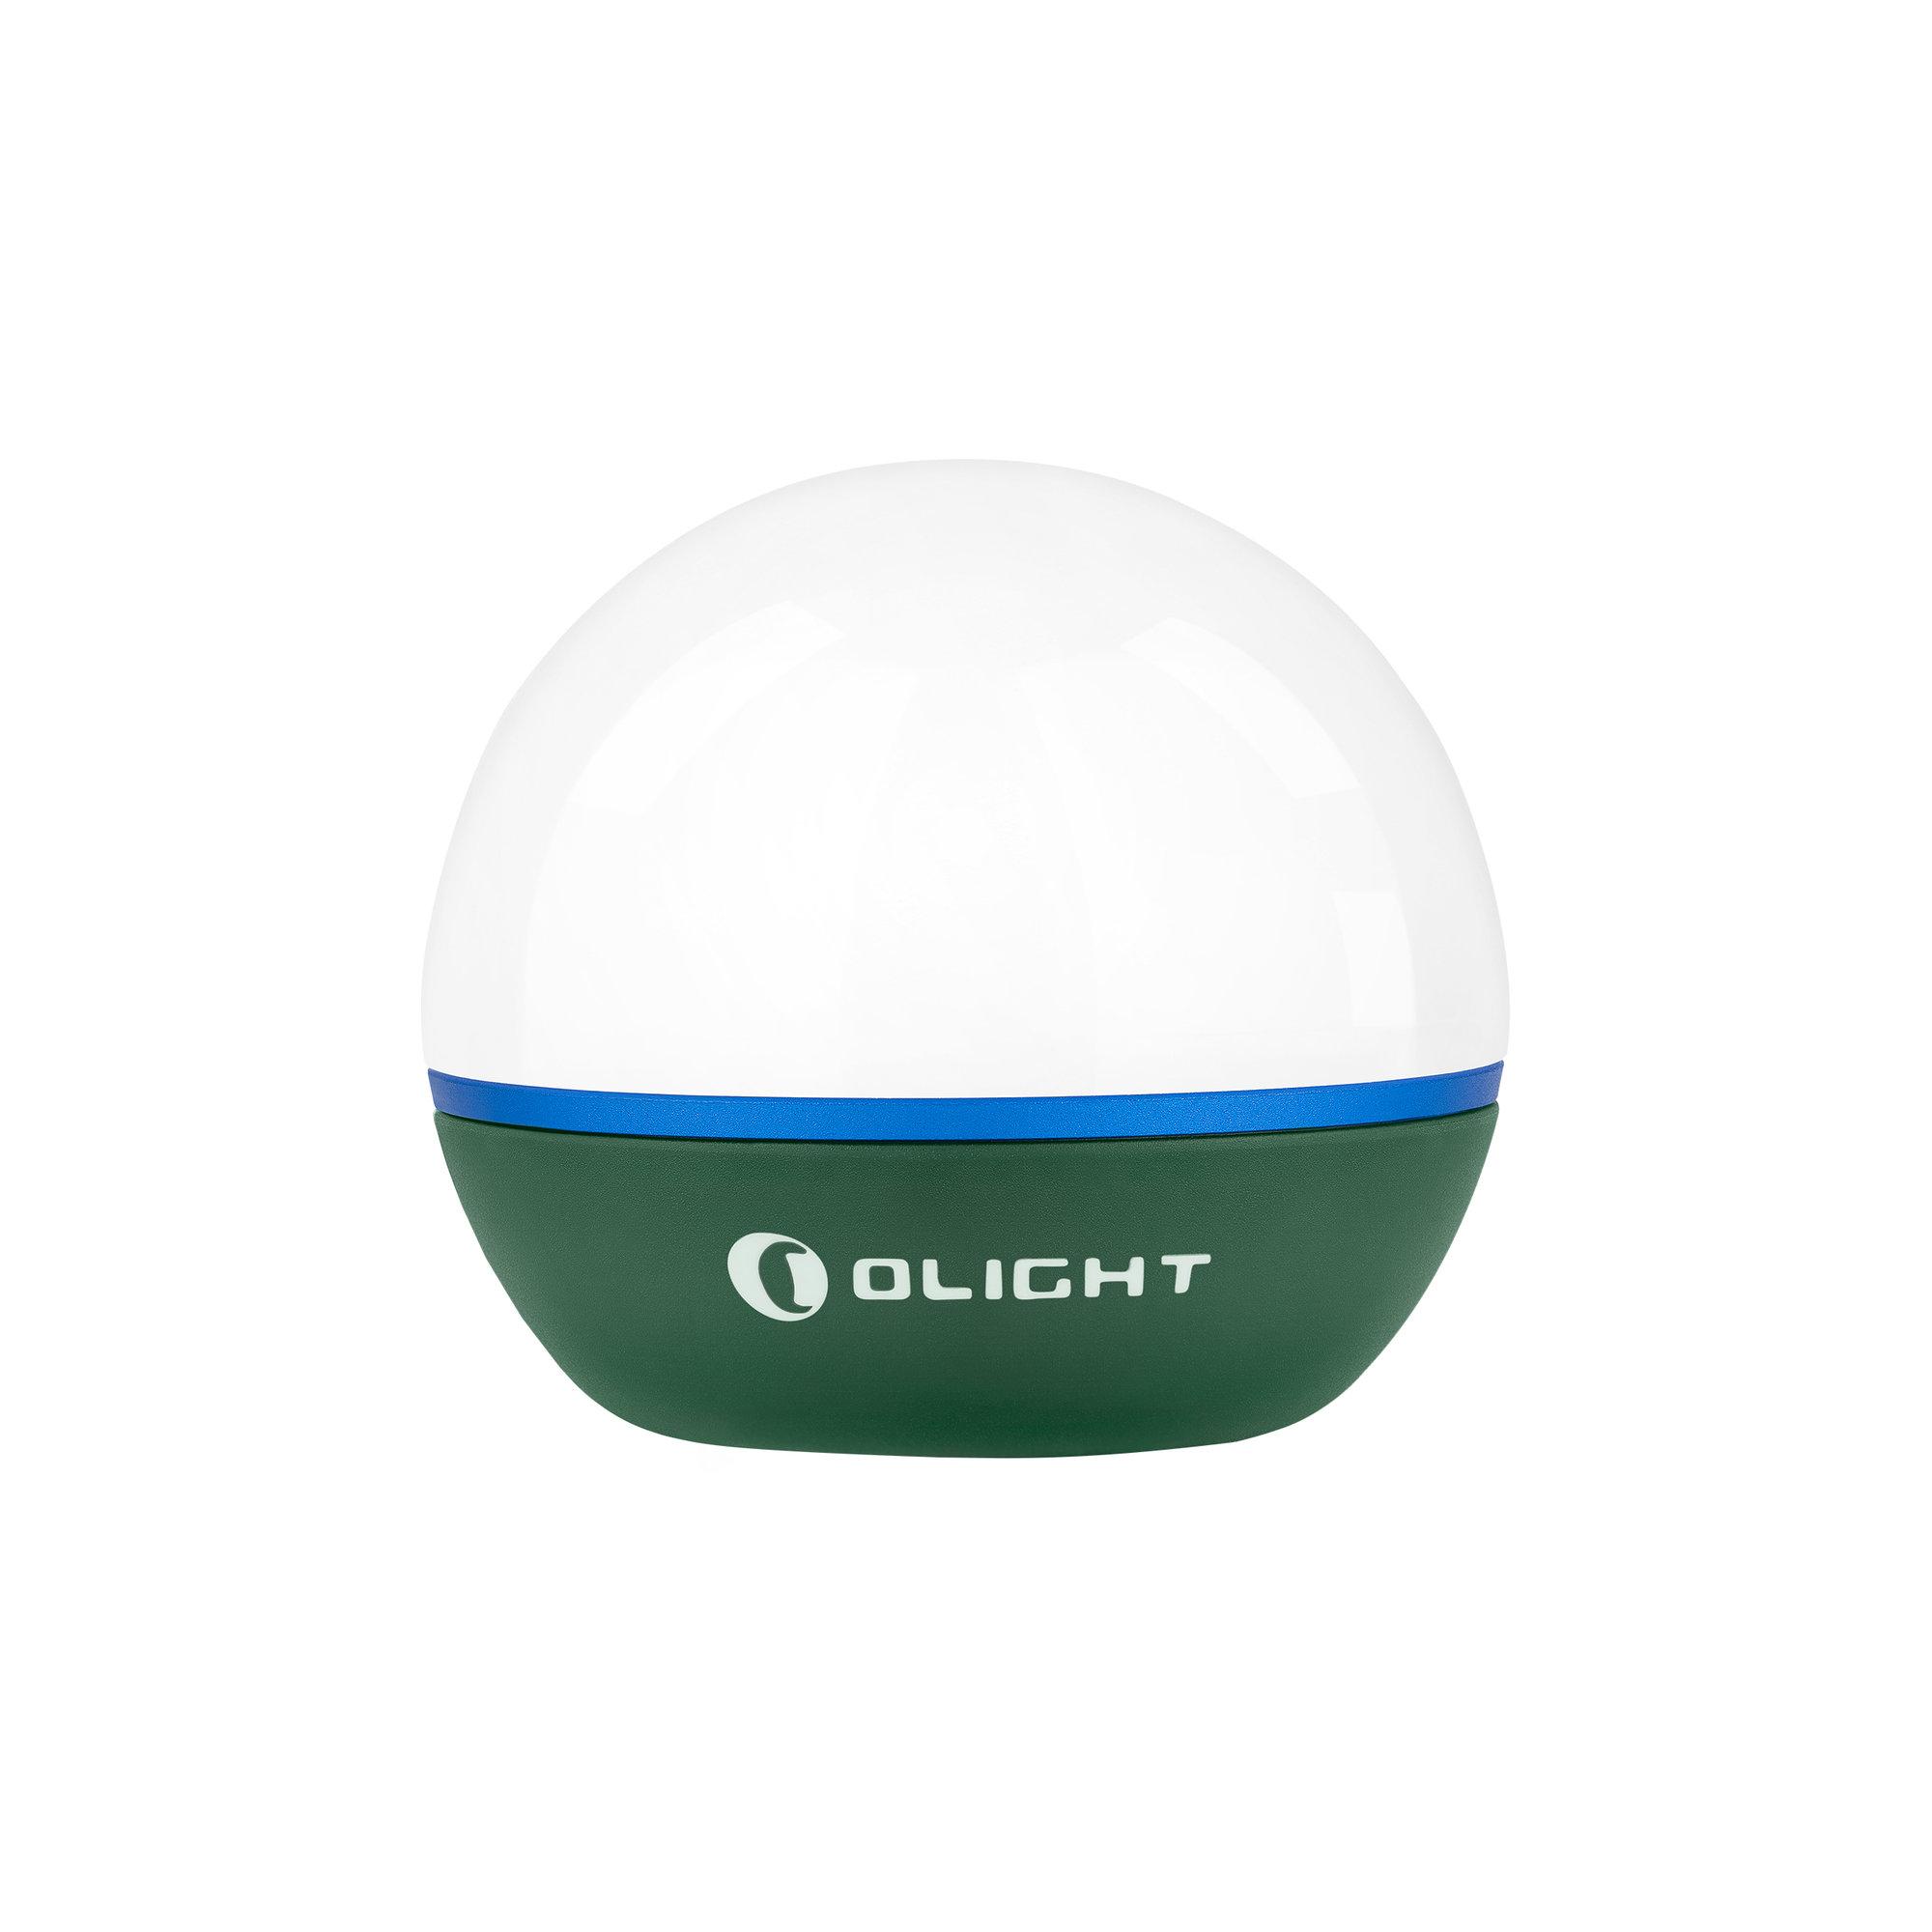 LED lampášik Olight Obulb 55 lm - Moss Green